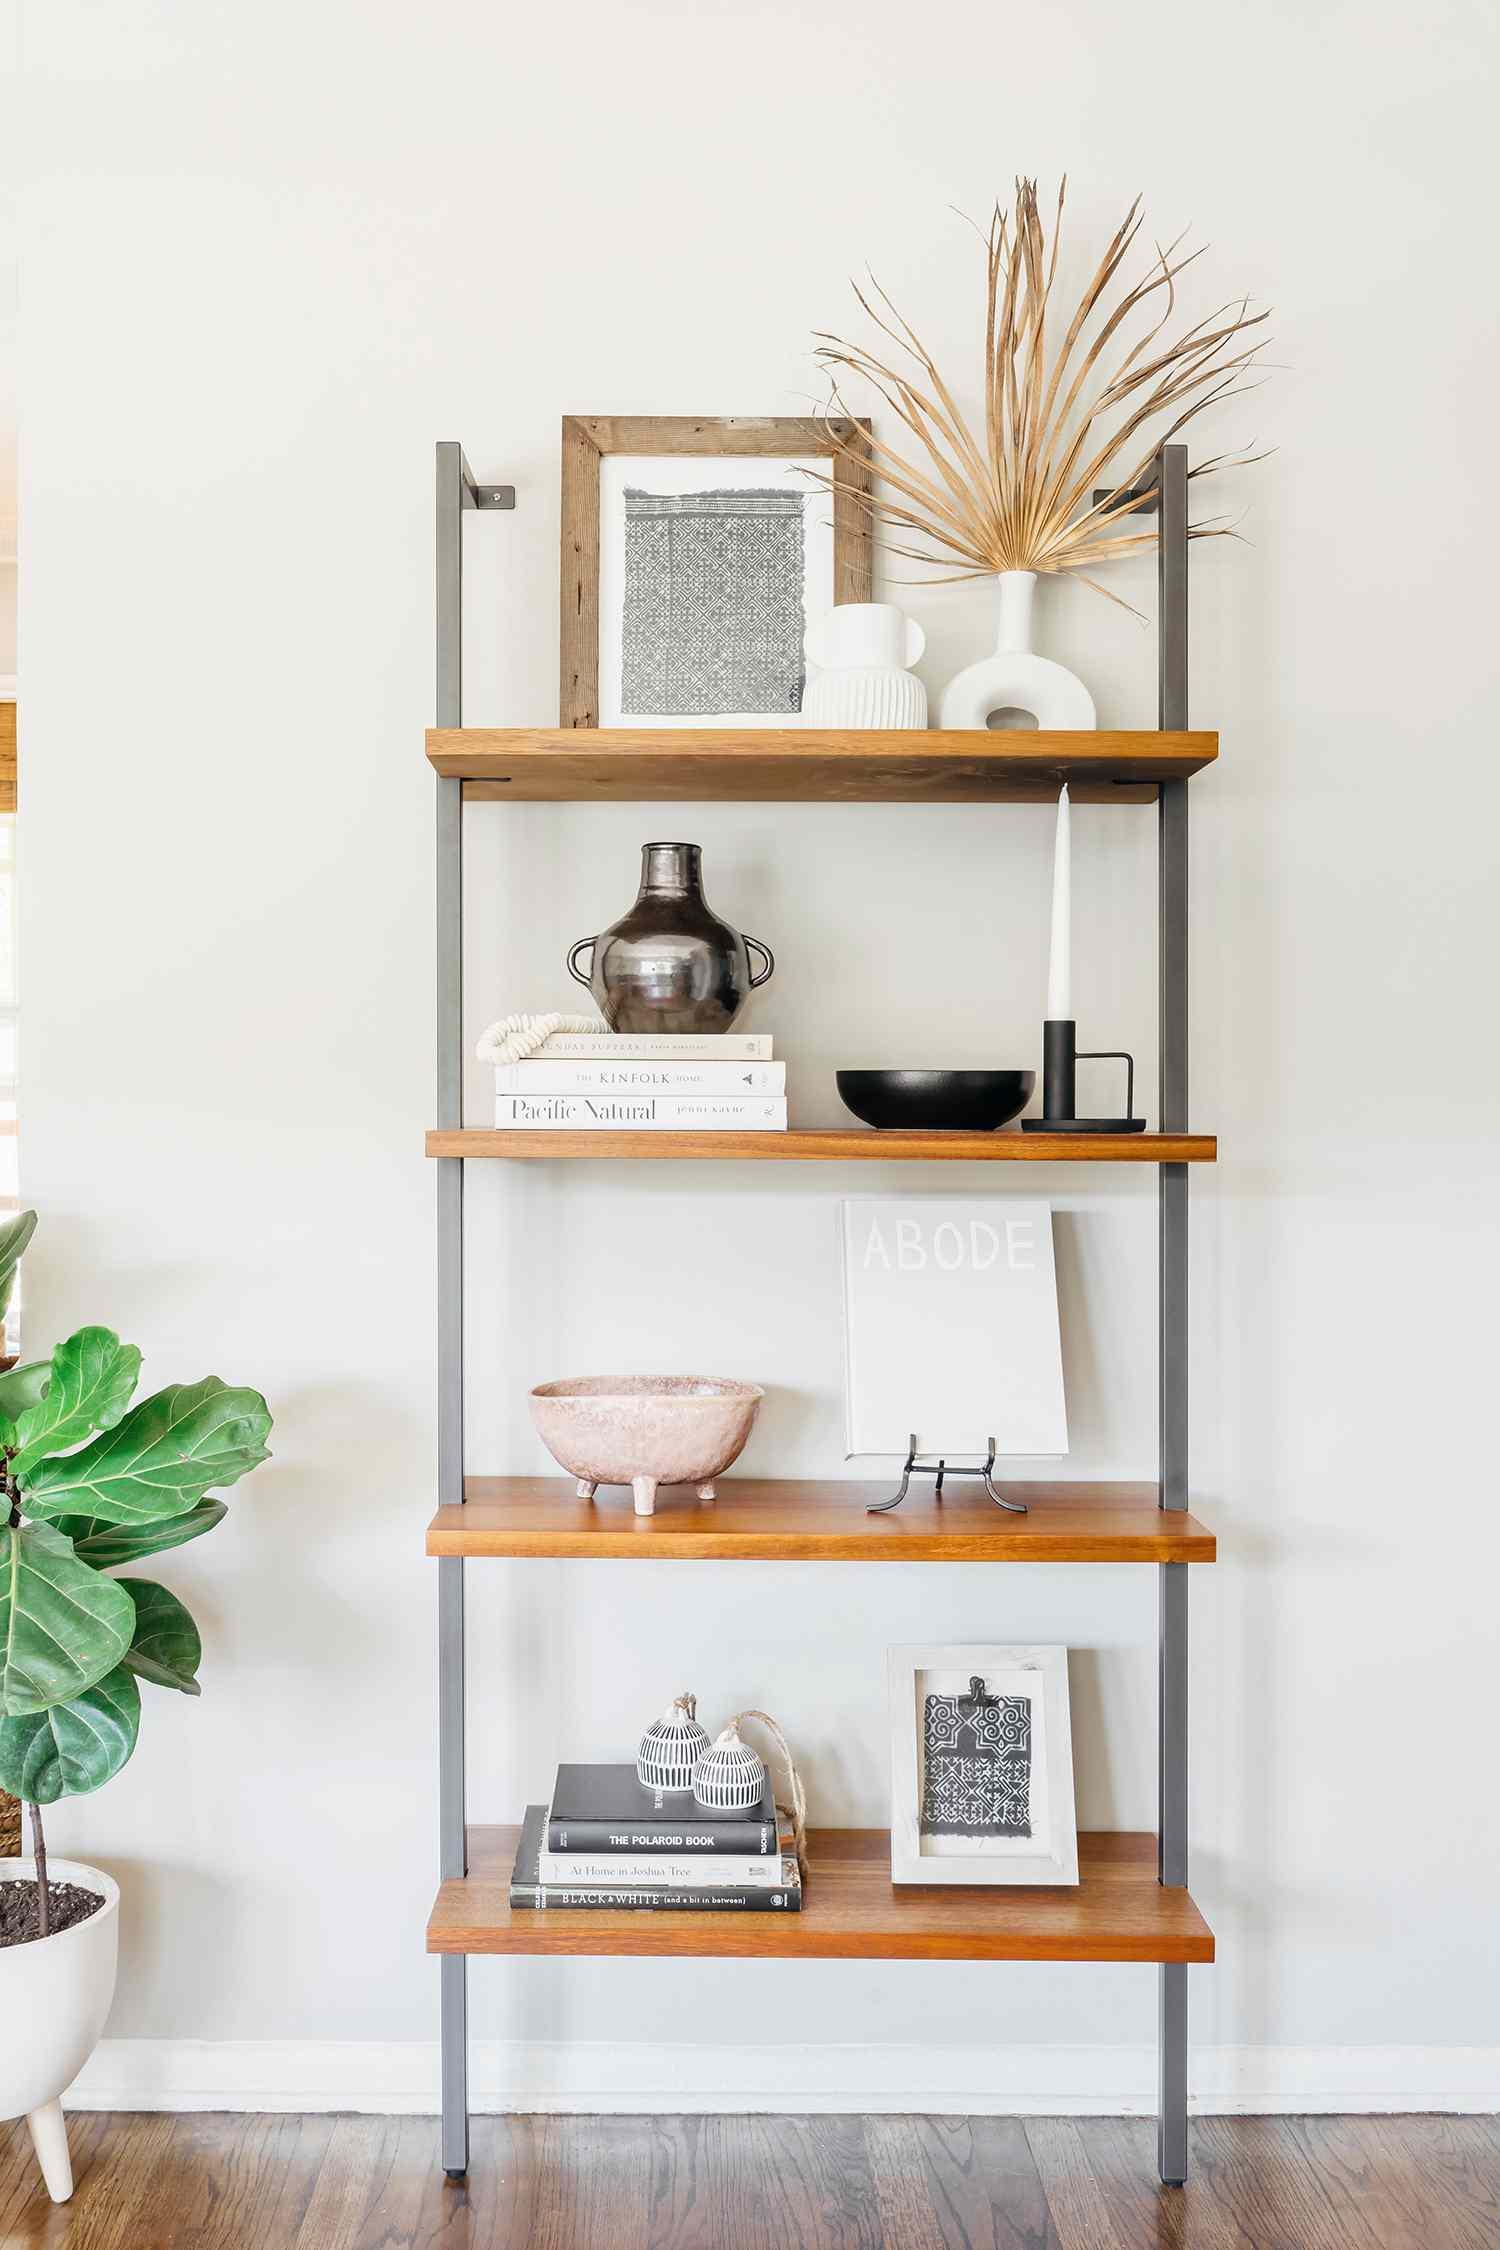 alisha agrellas home tour - bookshelf in living room